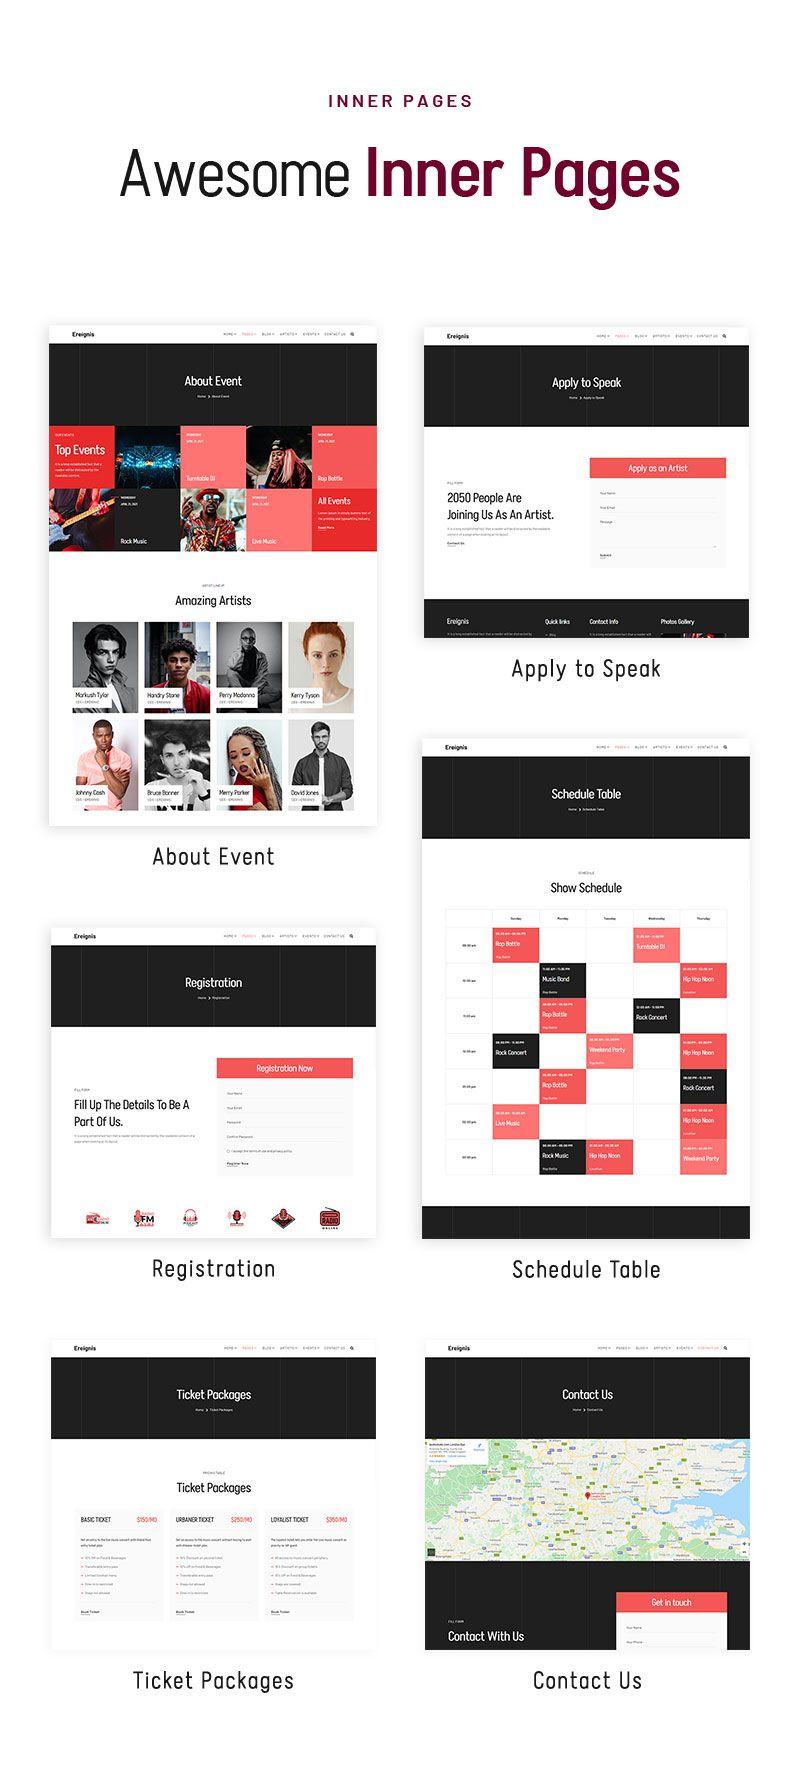 best wordpress theme for music festivals | Ereignis | Iqonic Design music concert wordpress theme Ereignis 03 inner pages